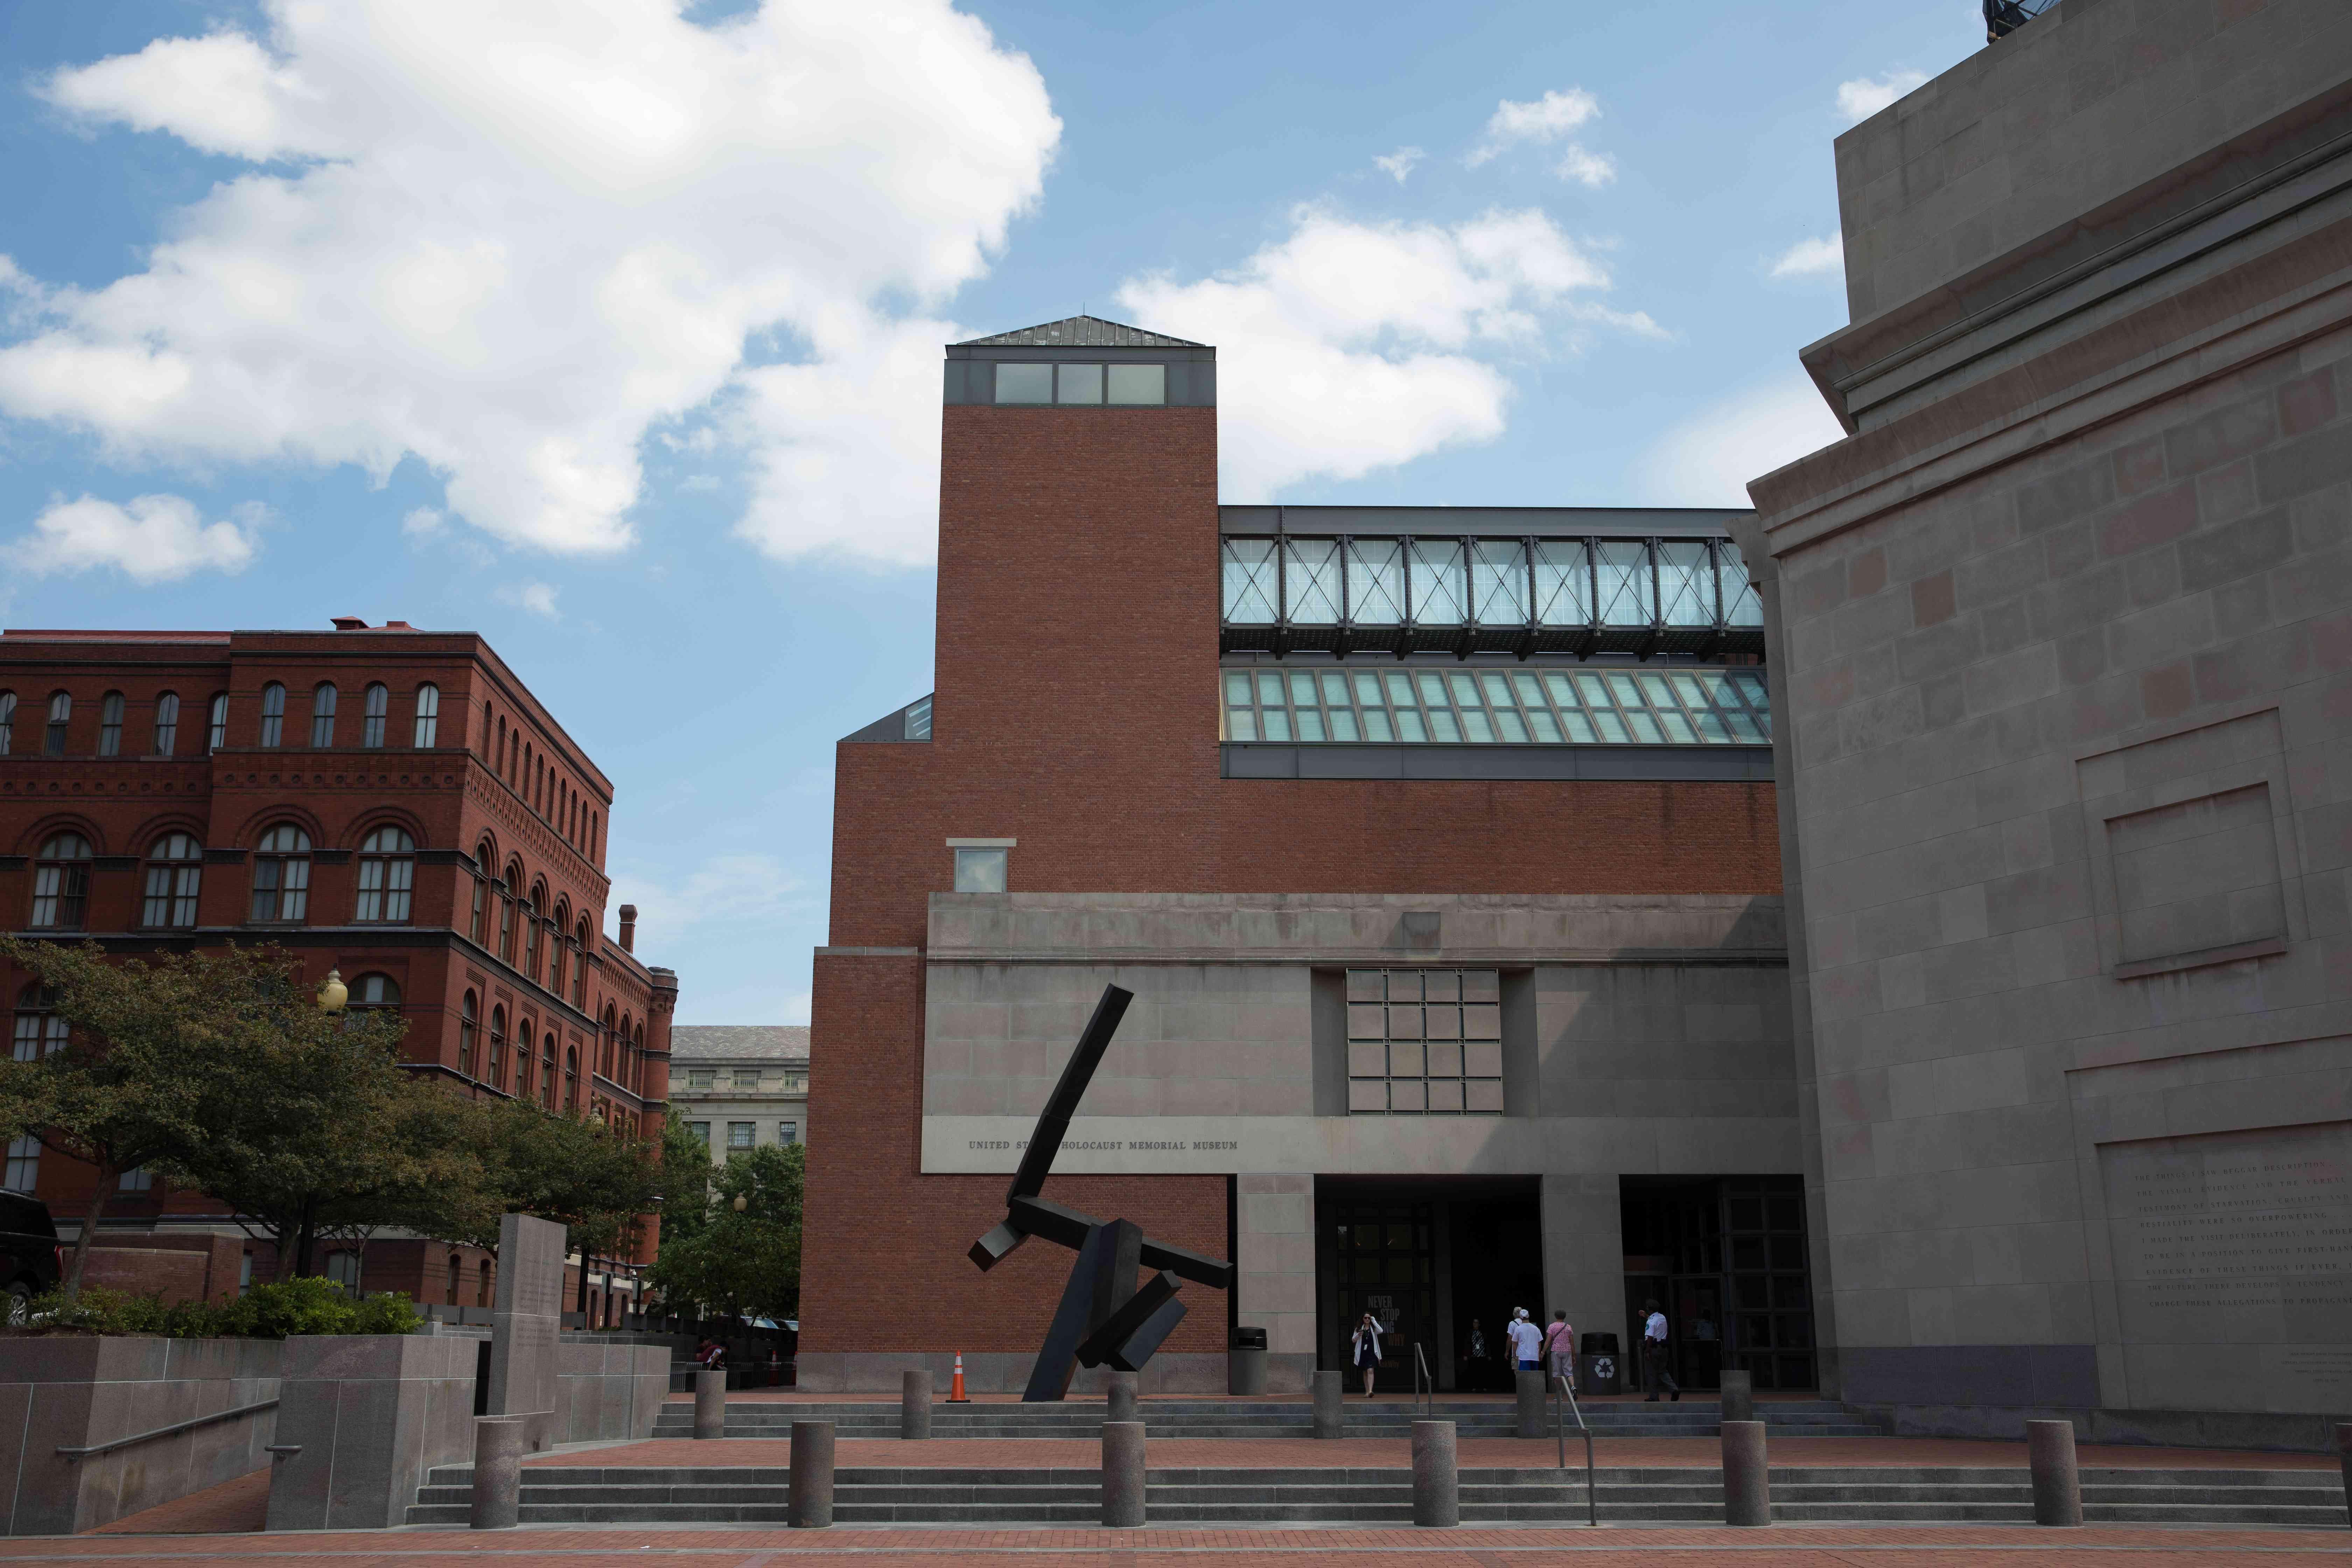 Exterior of the US Holocaust Memorial in DC